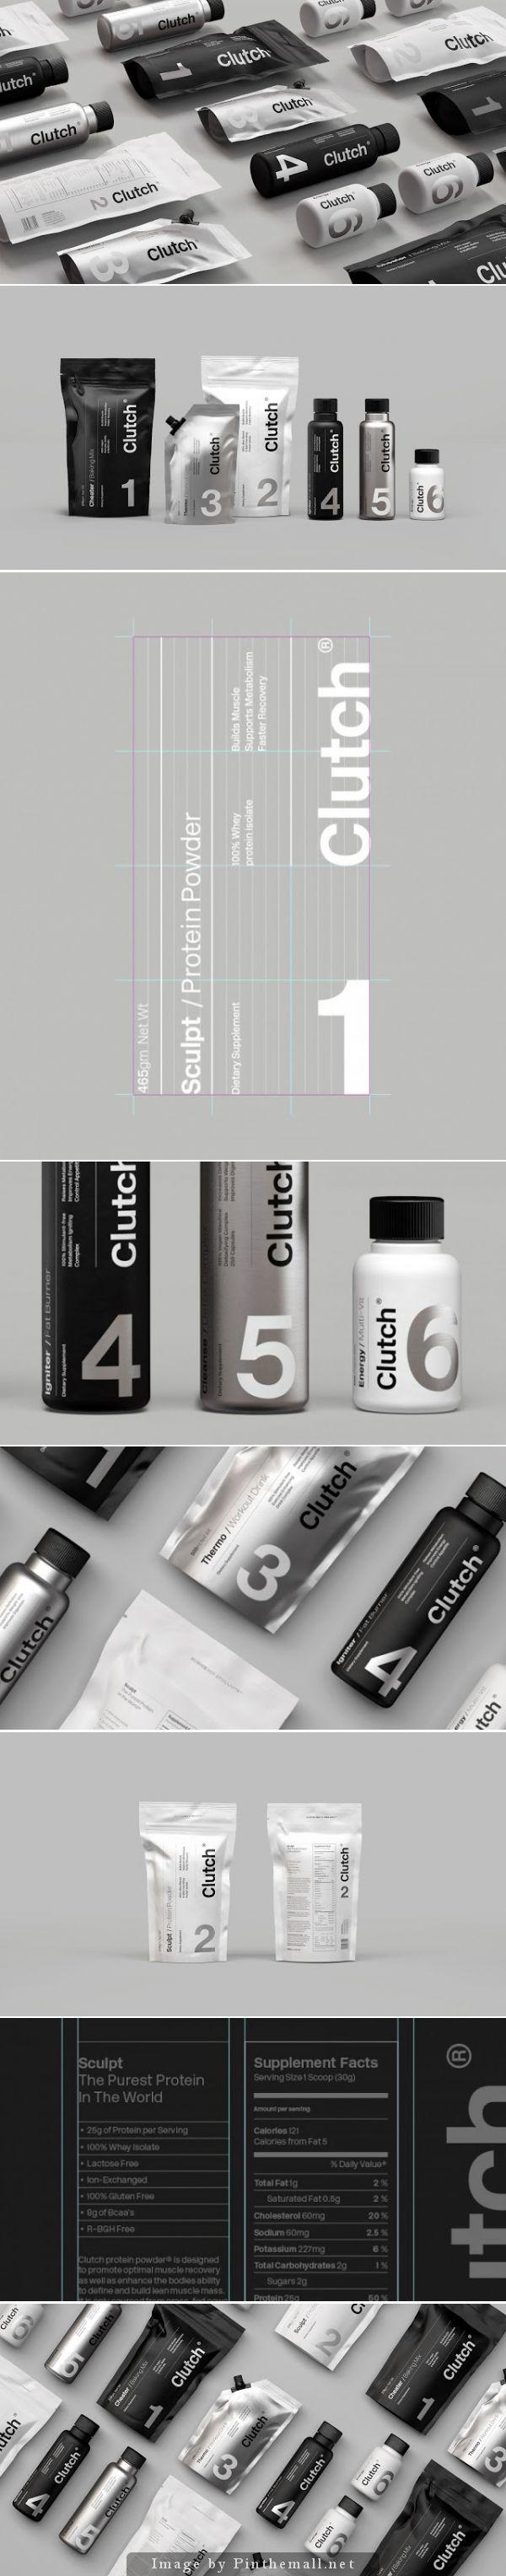 Clutch Bodyshop, Creative Agency: Socio Design - http://www.packagingoftheworld.com/2014/10/clutch-bodyshop.html